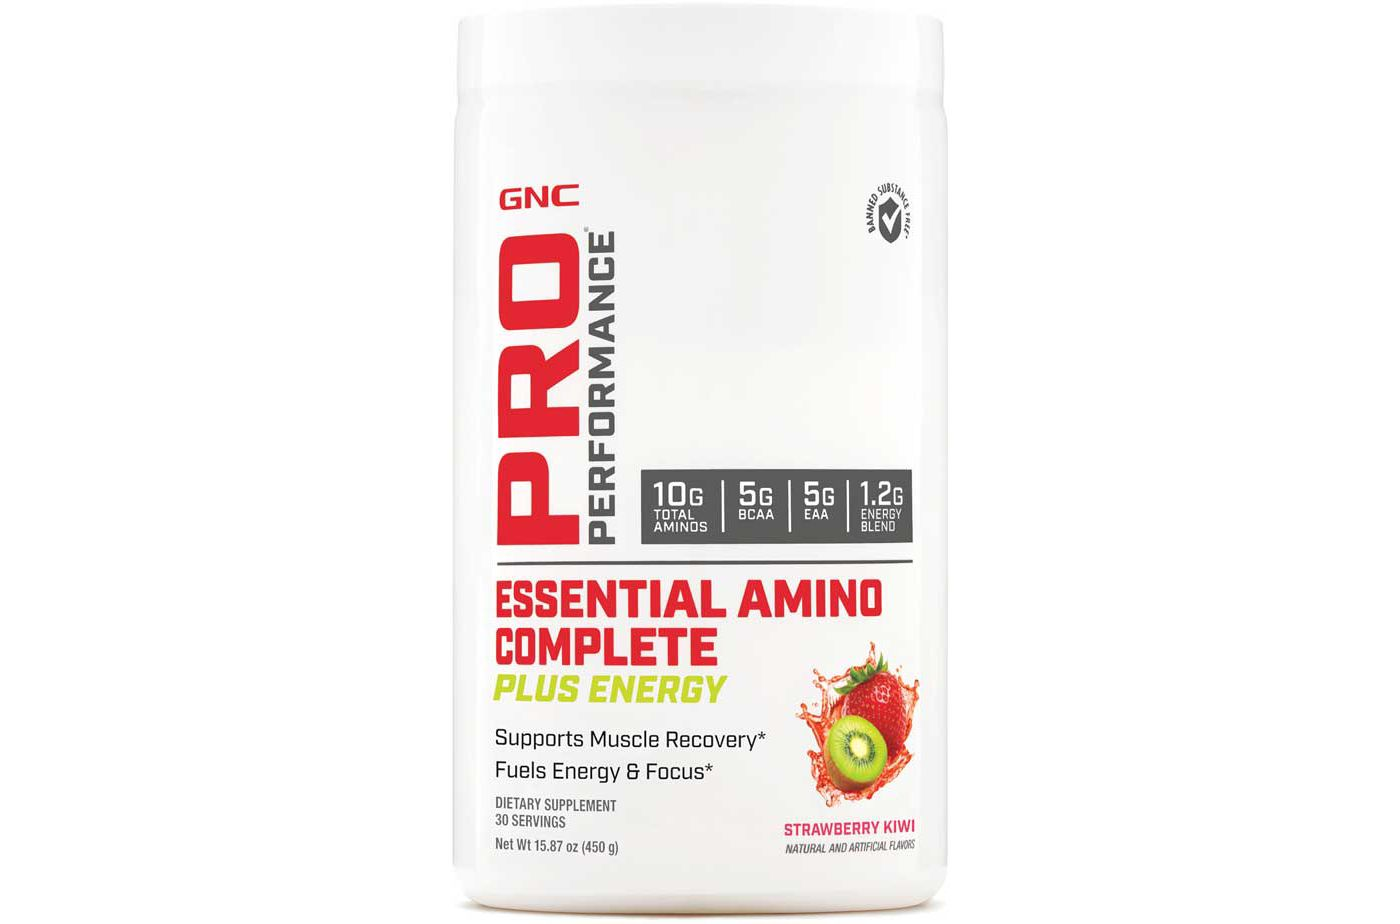 GNC Pro Performance Essential Amino Complete Plus Energy Strawberry Kiwi 30 Servings